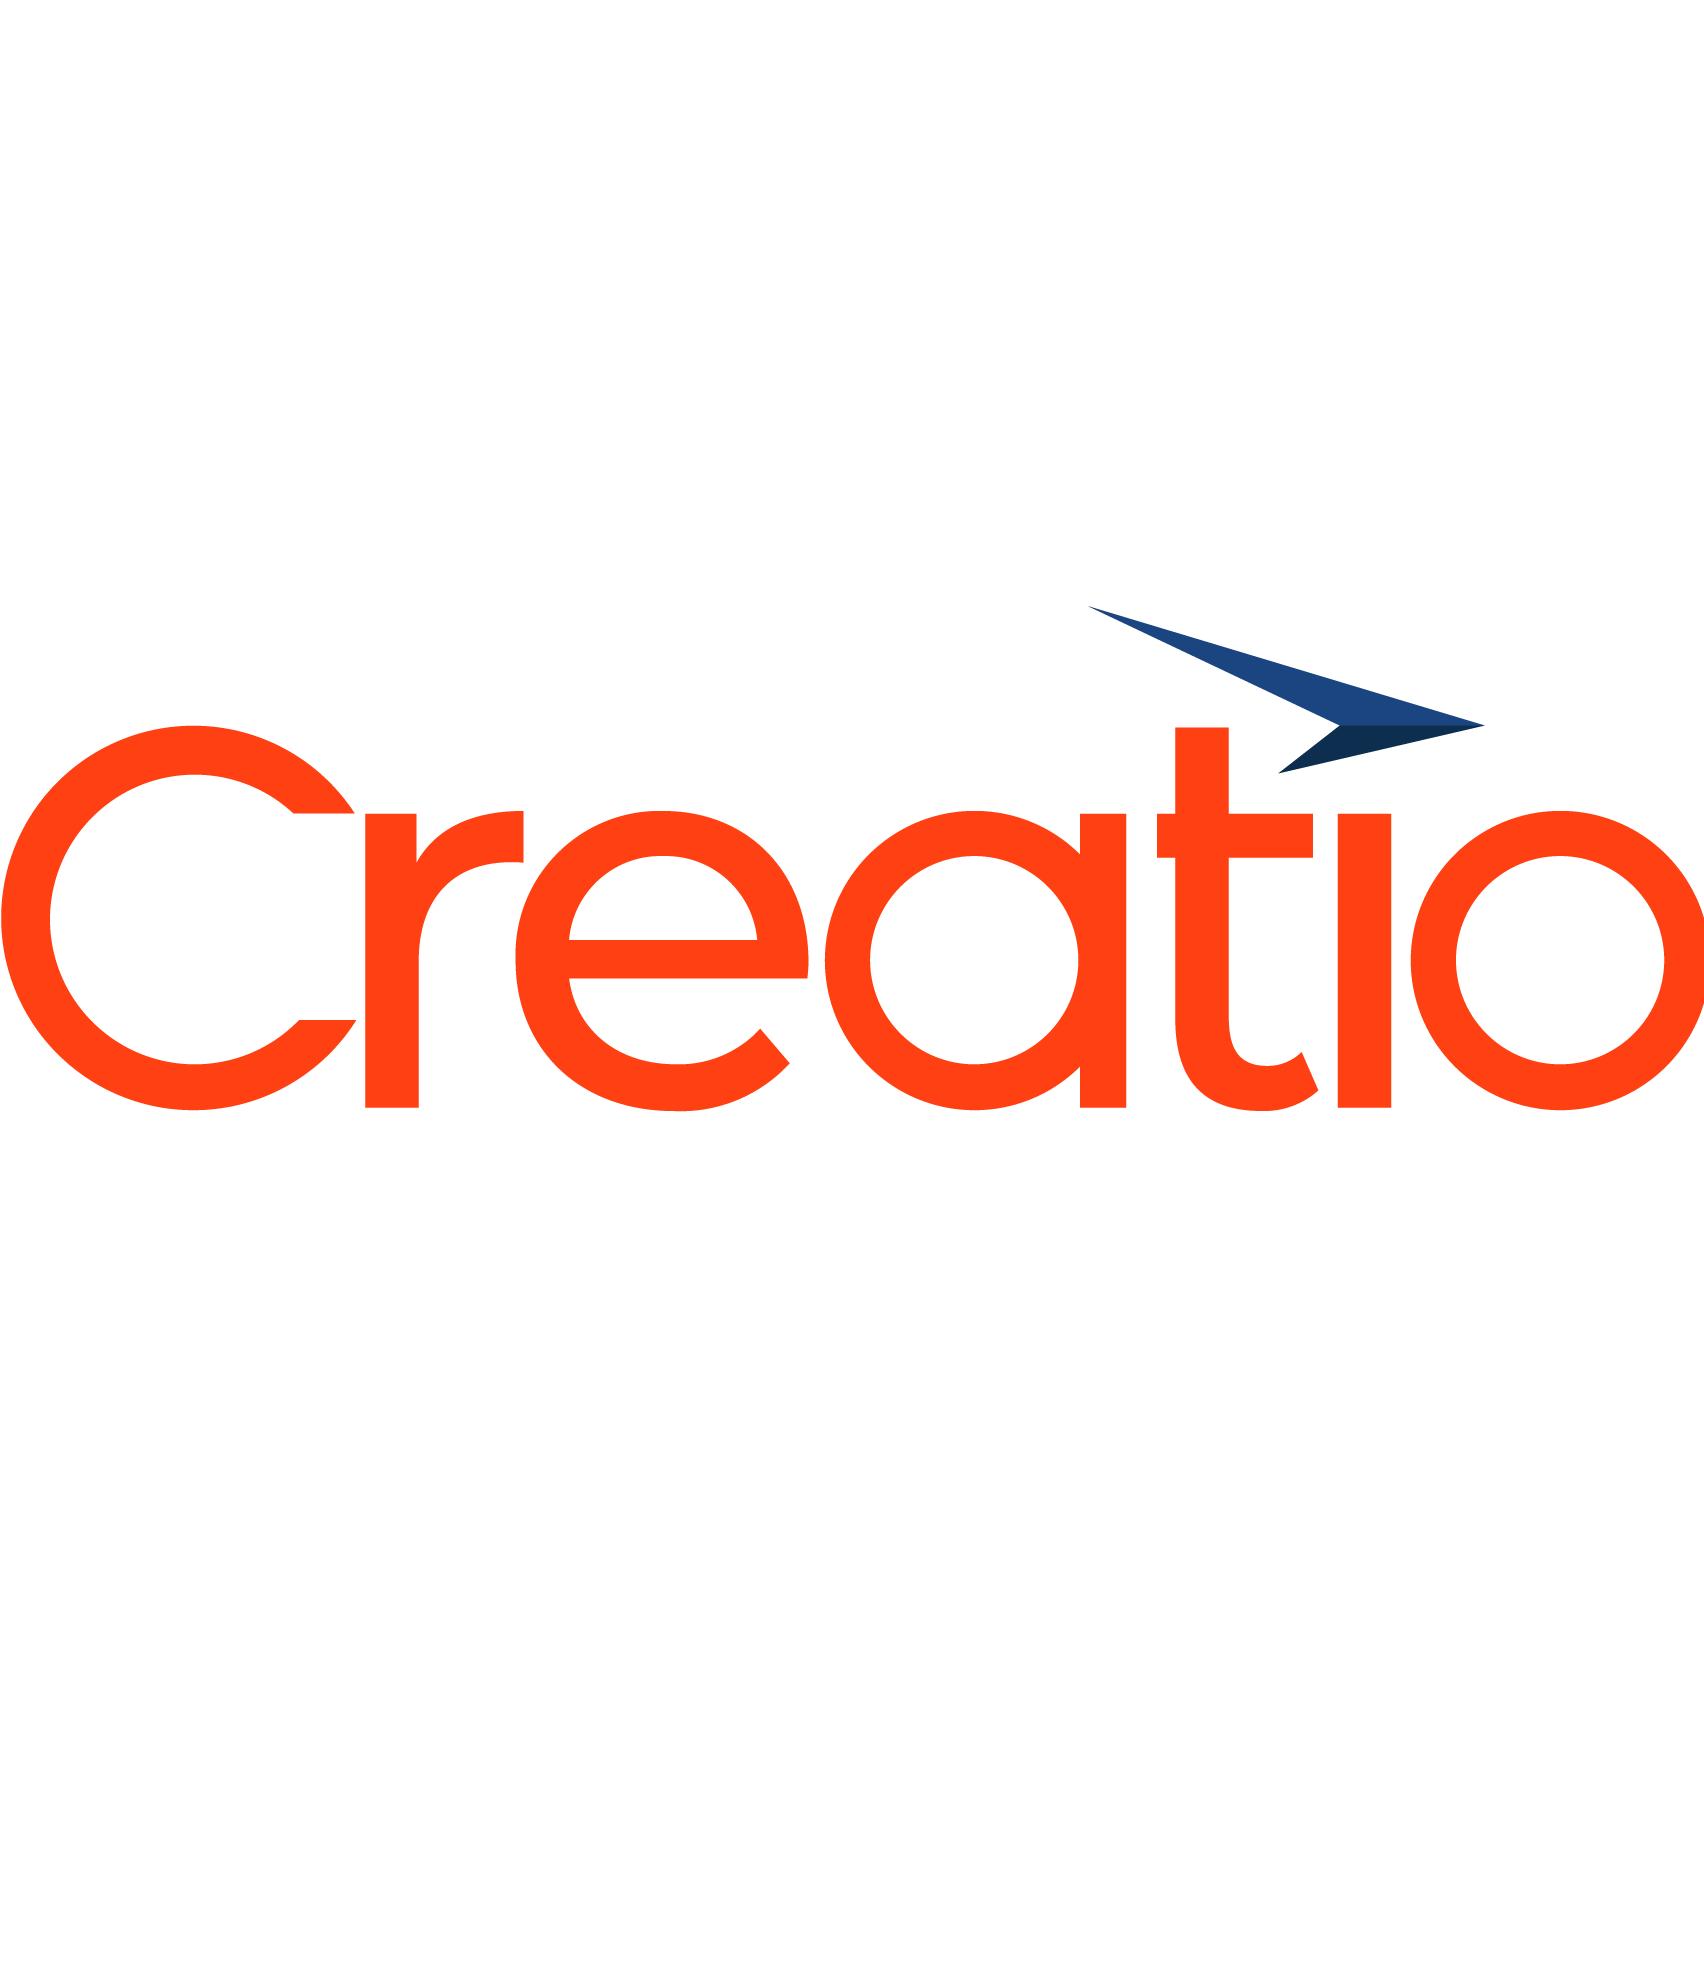 Studio Creatio logo